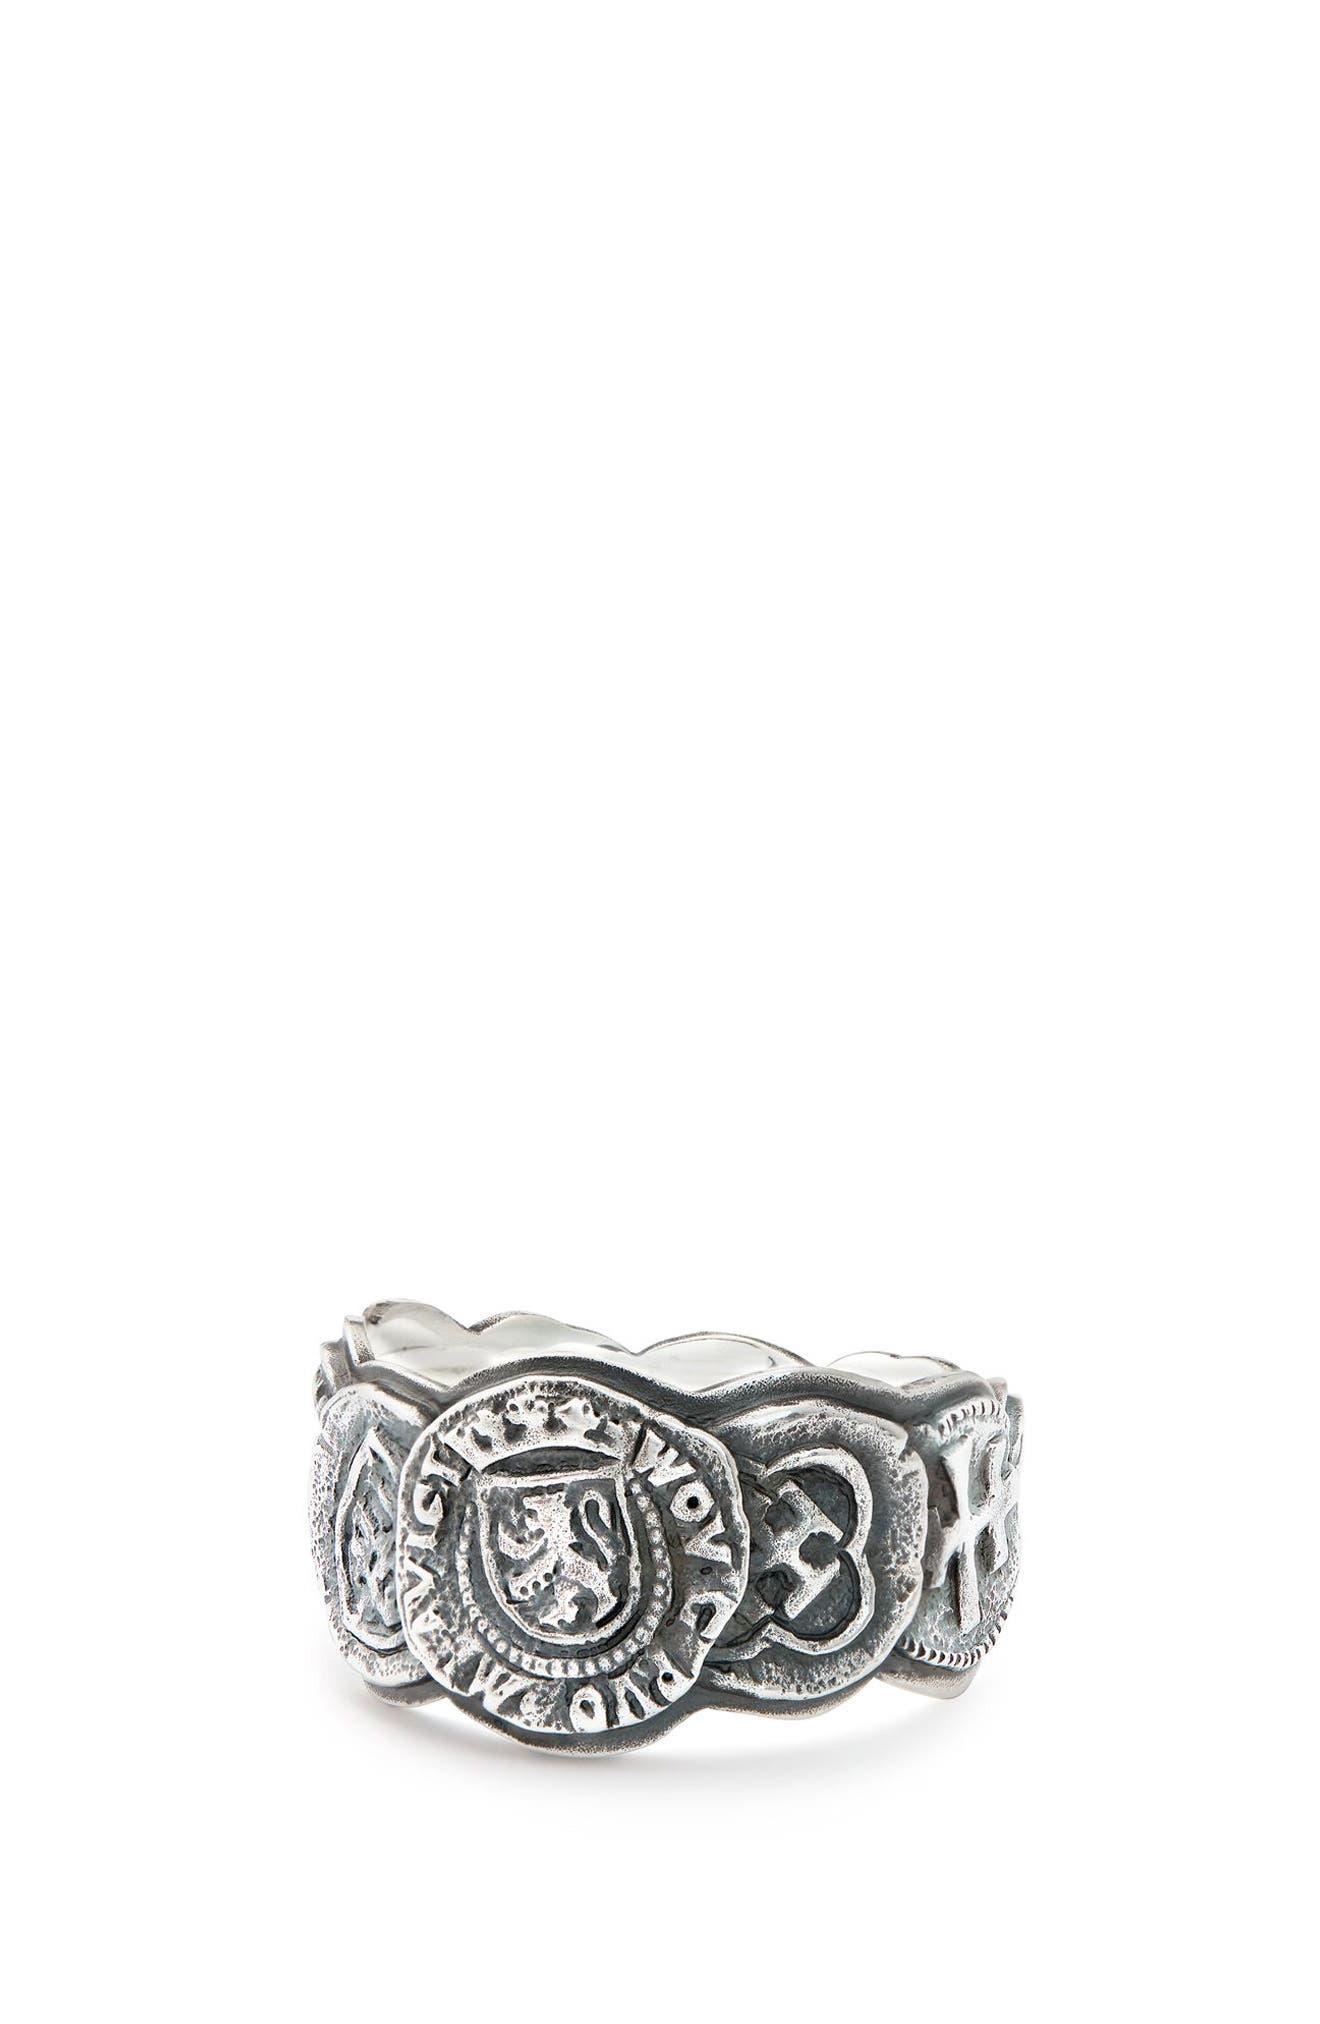 Main Image - David Yurman Shipwreck Coin Band Ring, 12mm